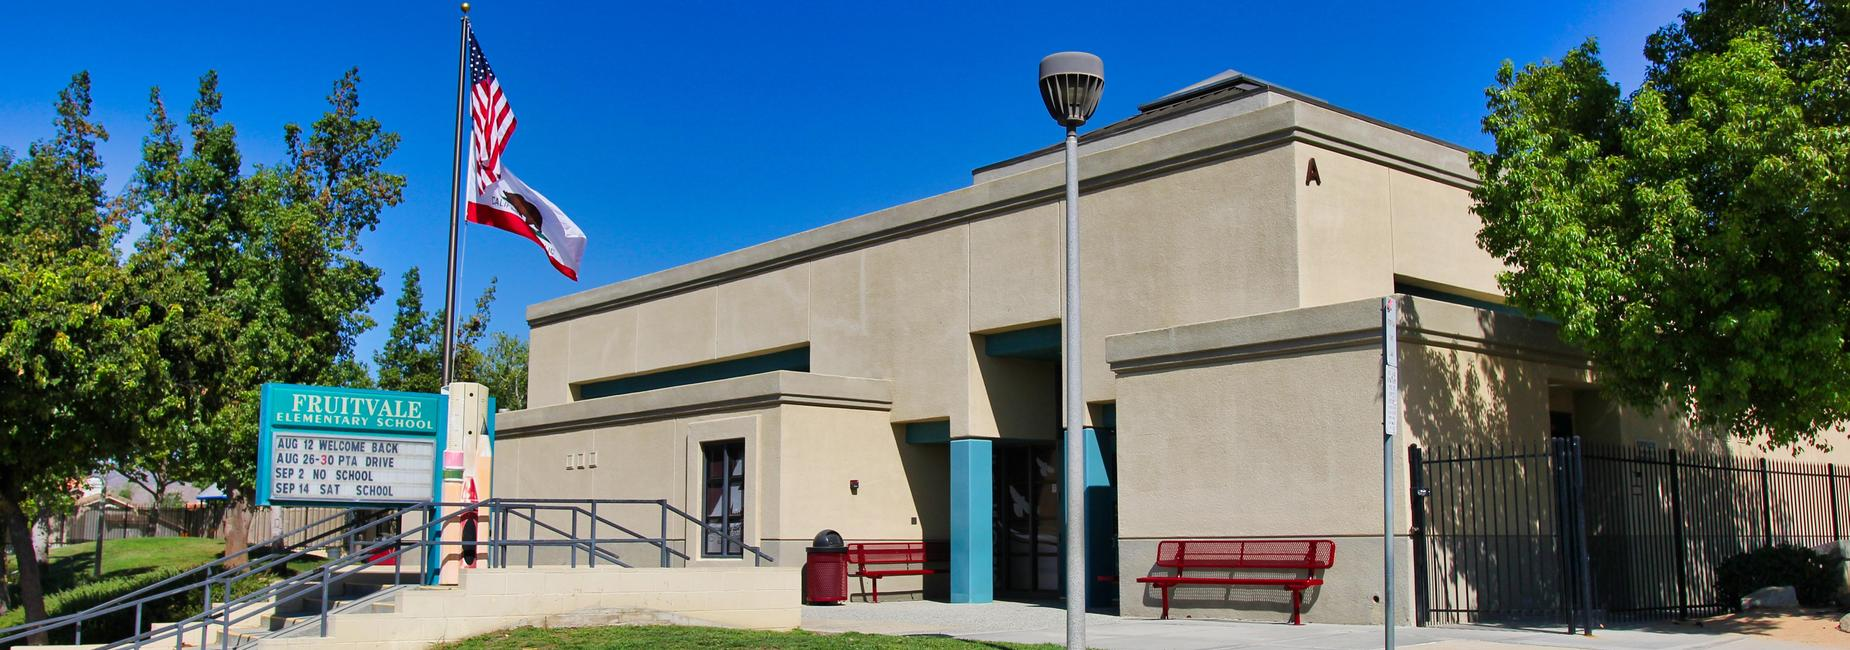 Fruitvale Elementary school entrance